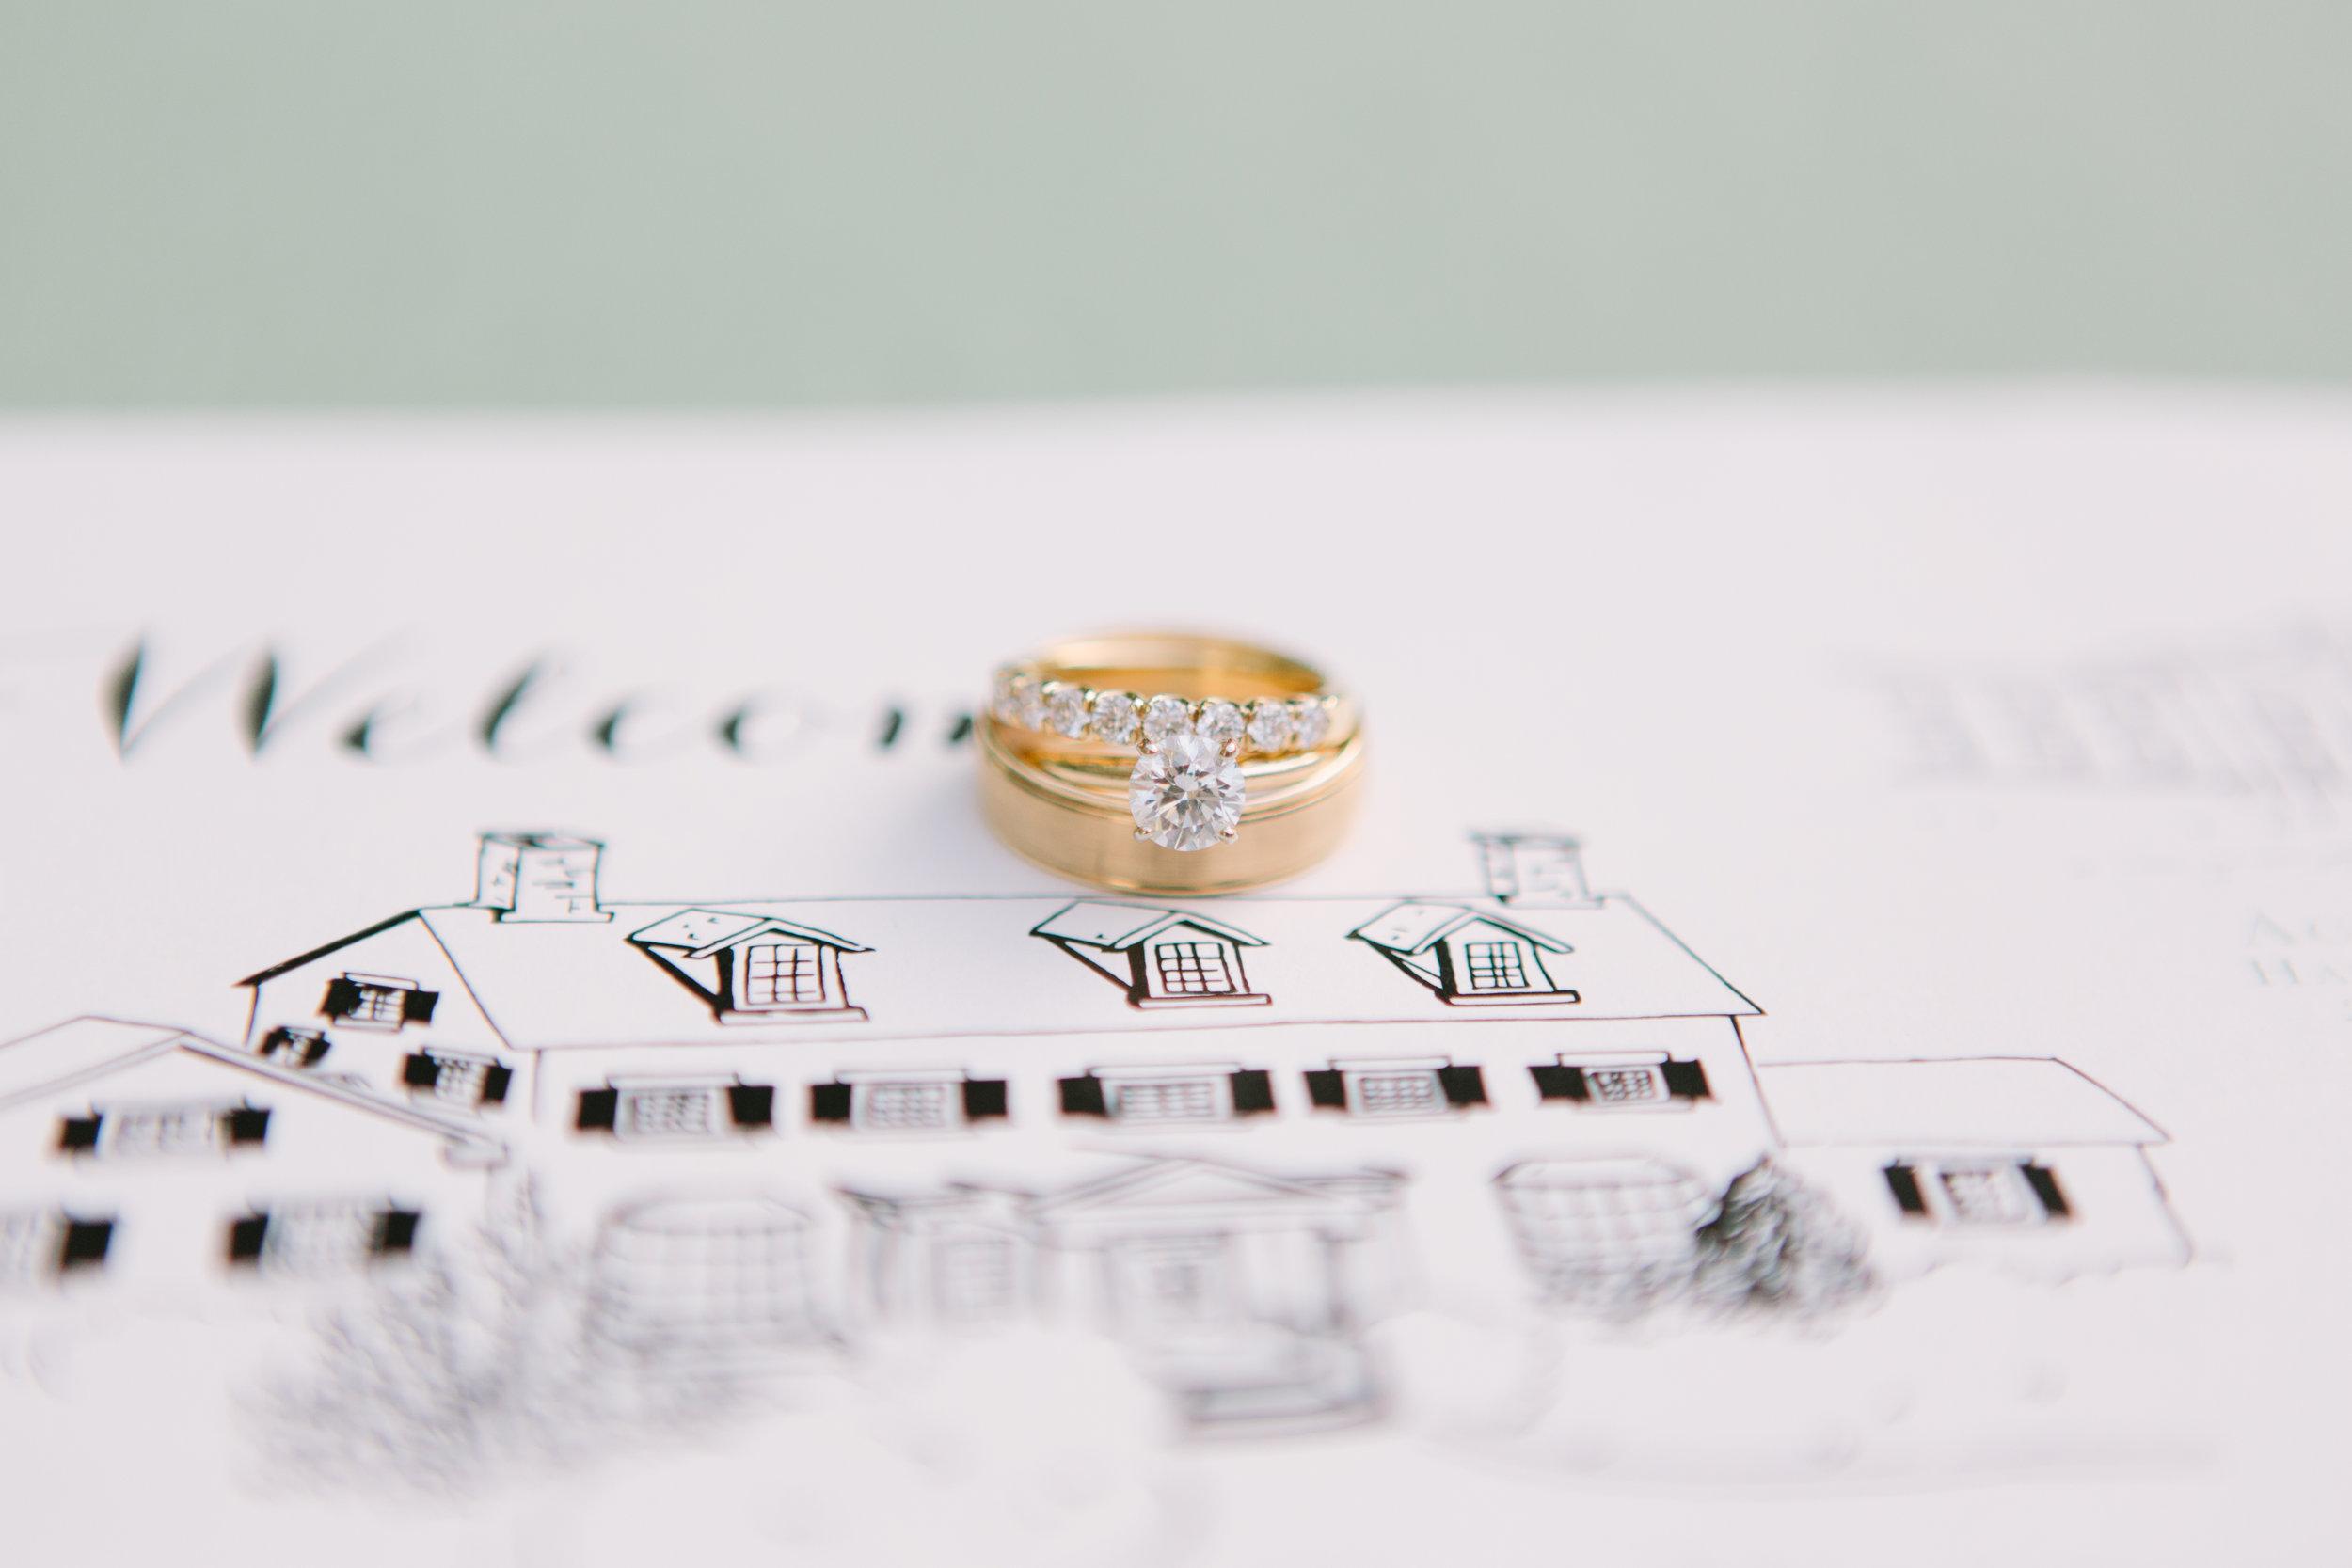 76cfd-weddingringcustominvitationmapweddingringcustominvitationmap.jpg